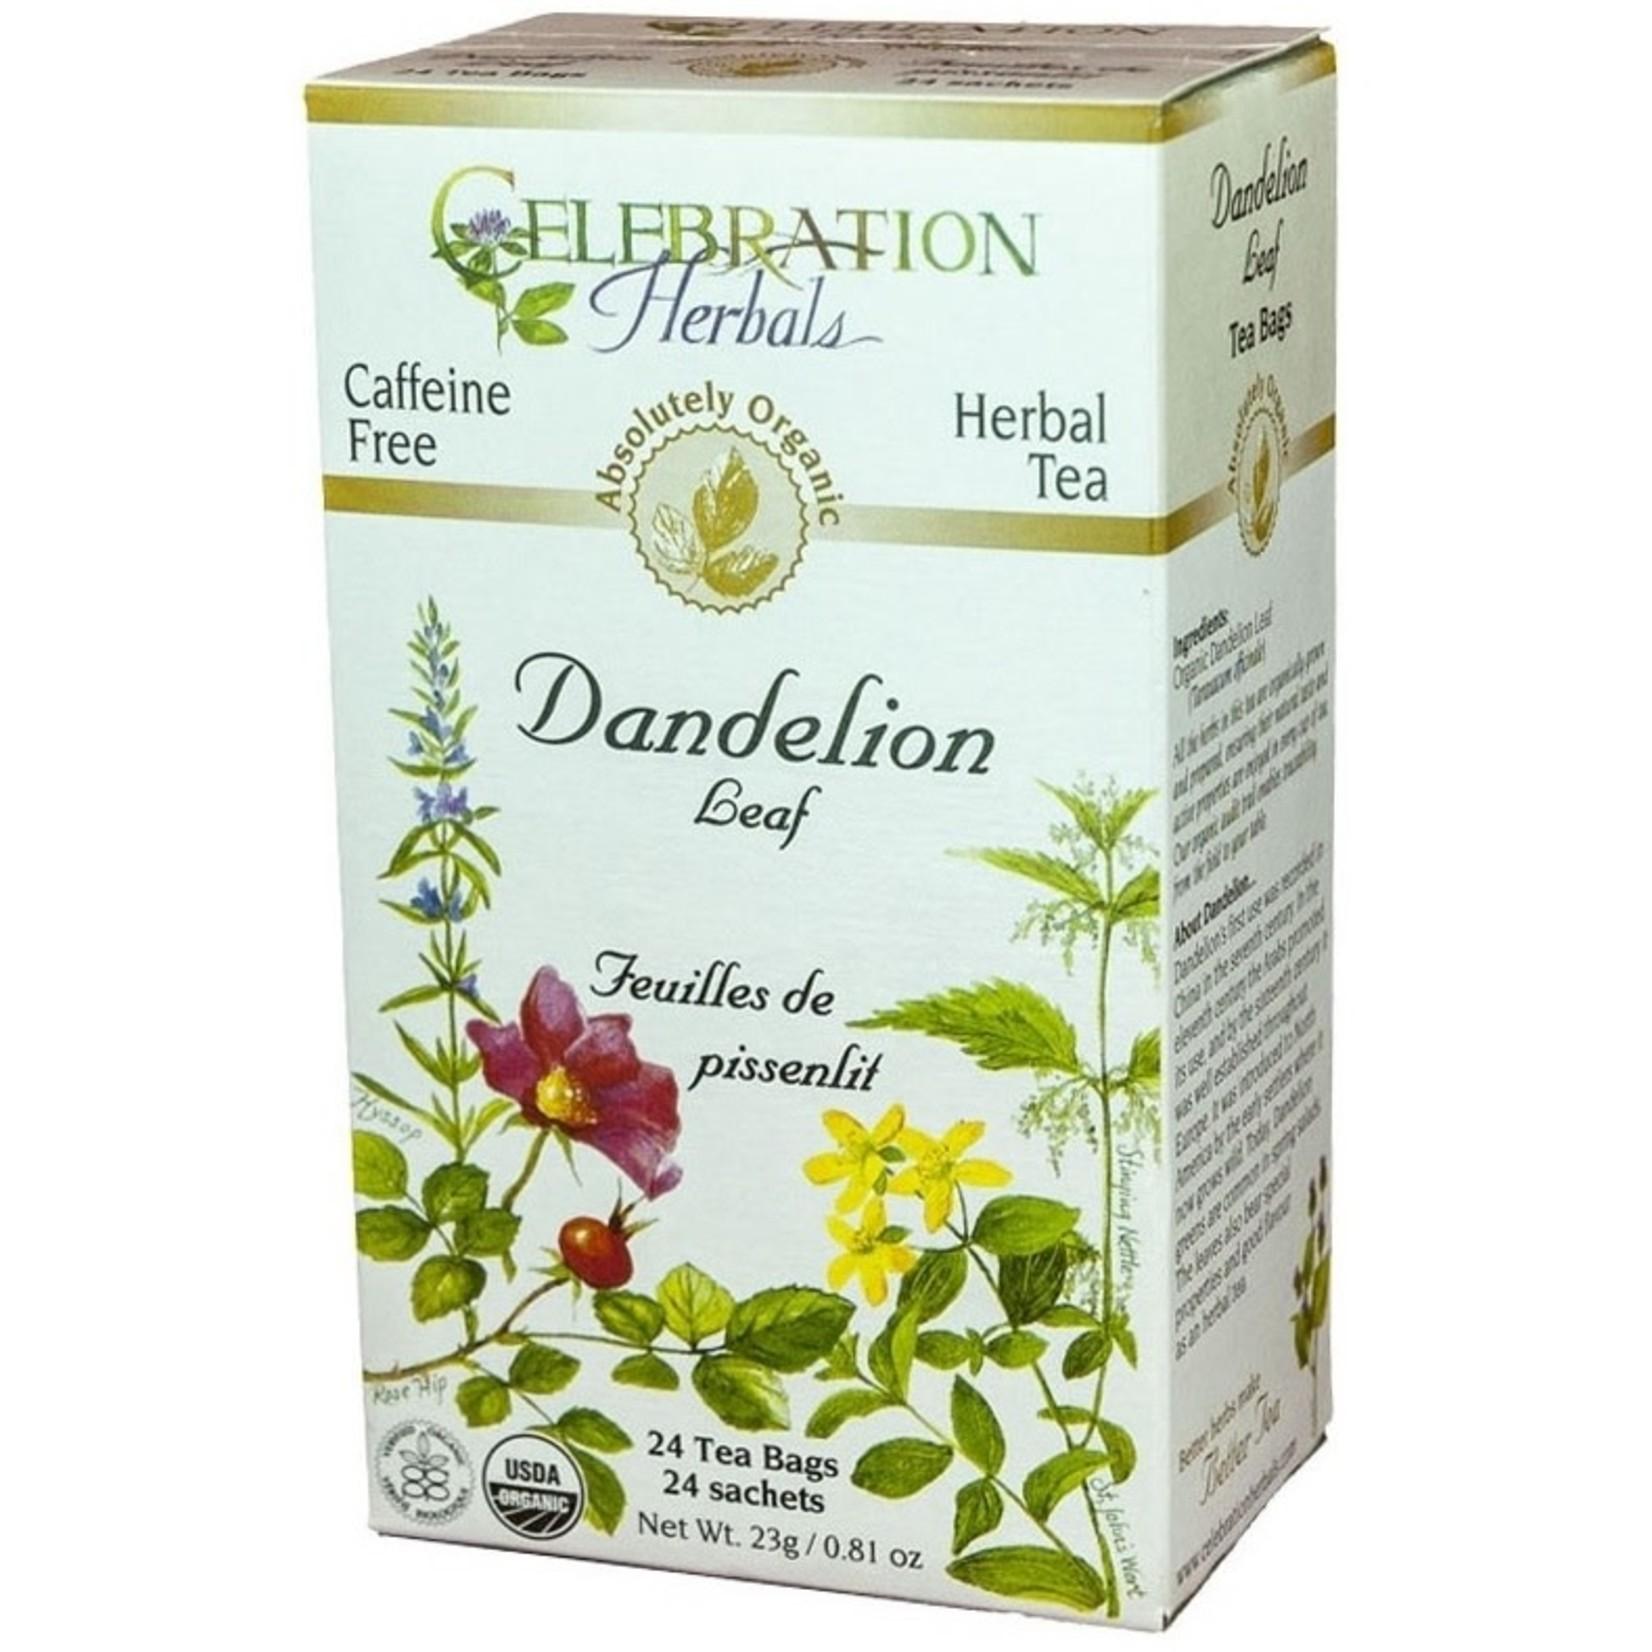 Celebration Herbals Celebration Herbals Dandelion Leaf Tea 24 Tea Bags